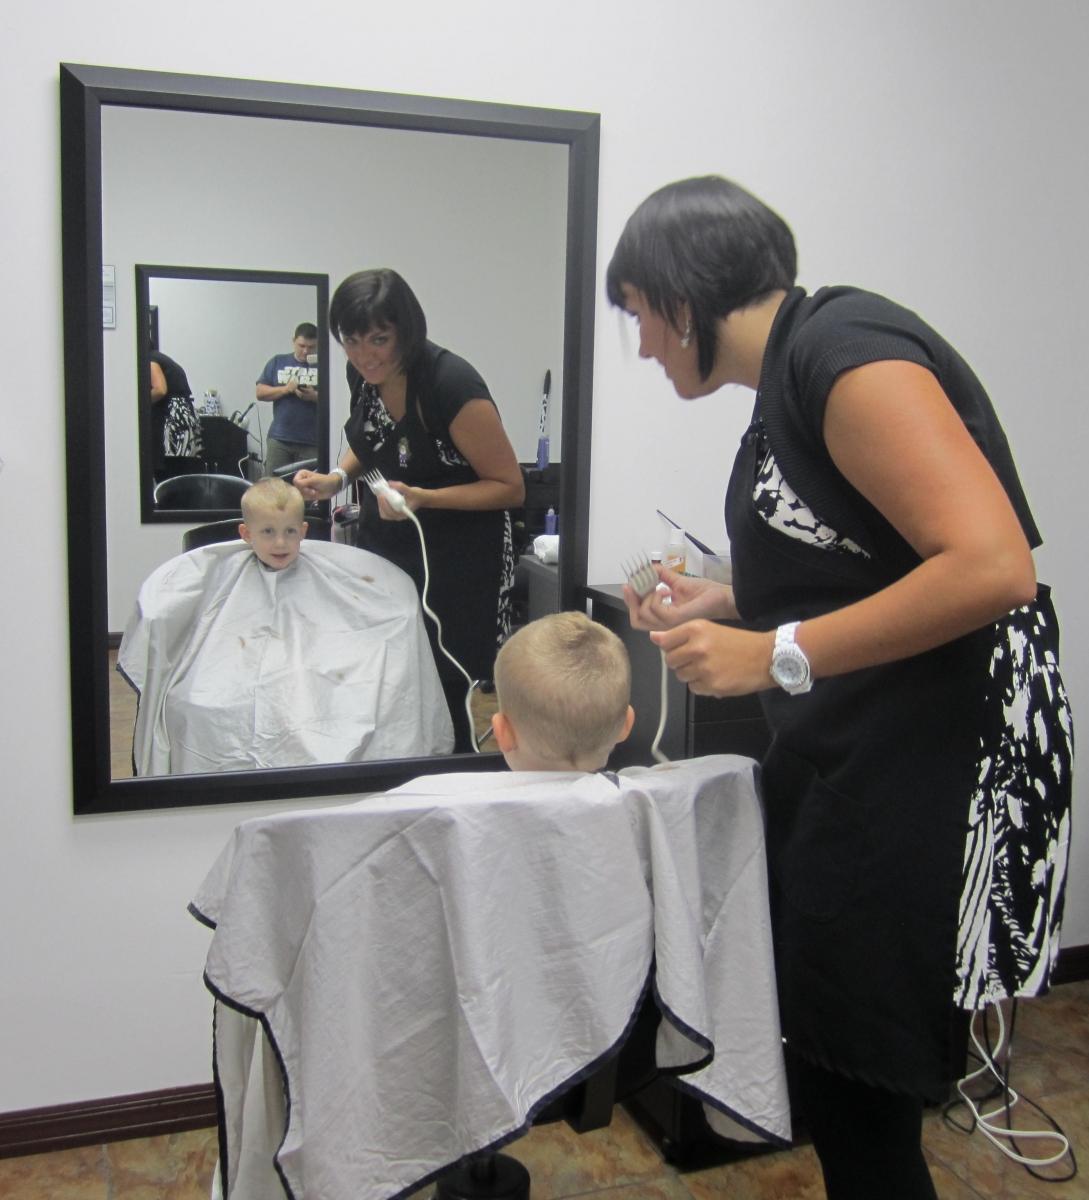 Aimee cutting her nephew's hair